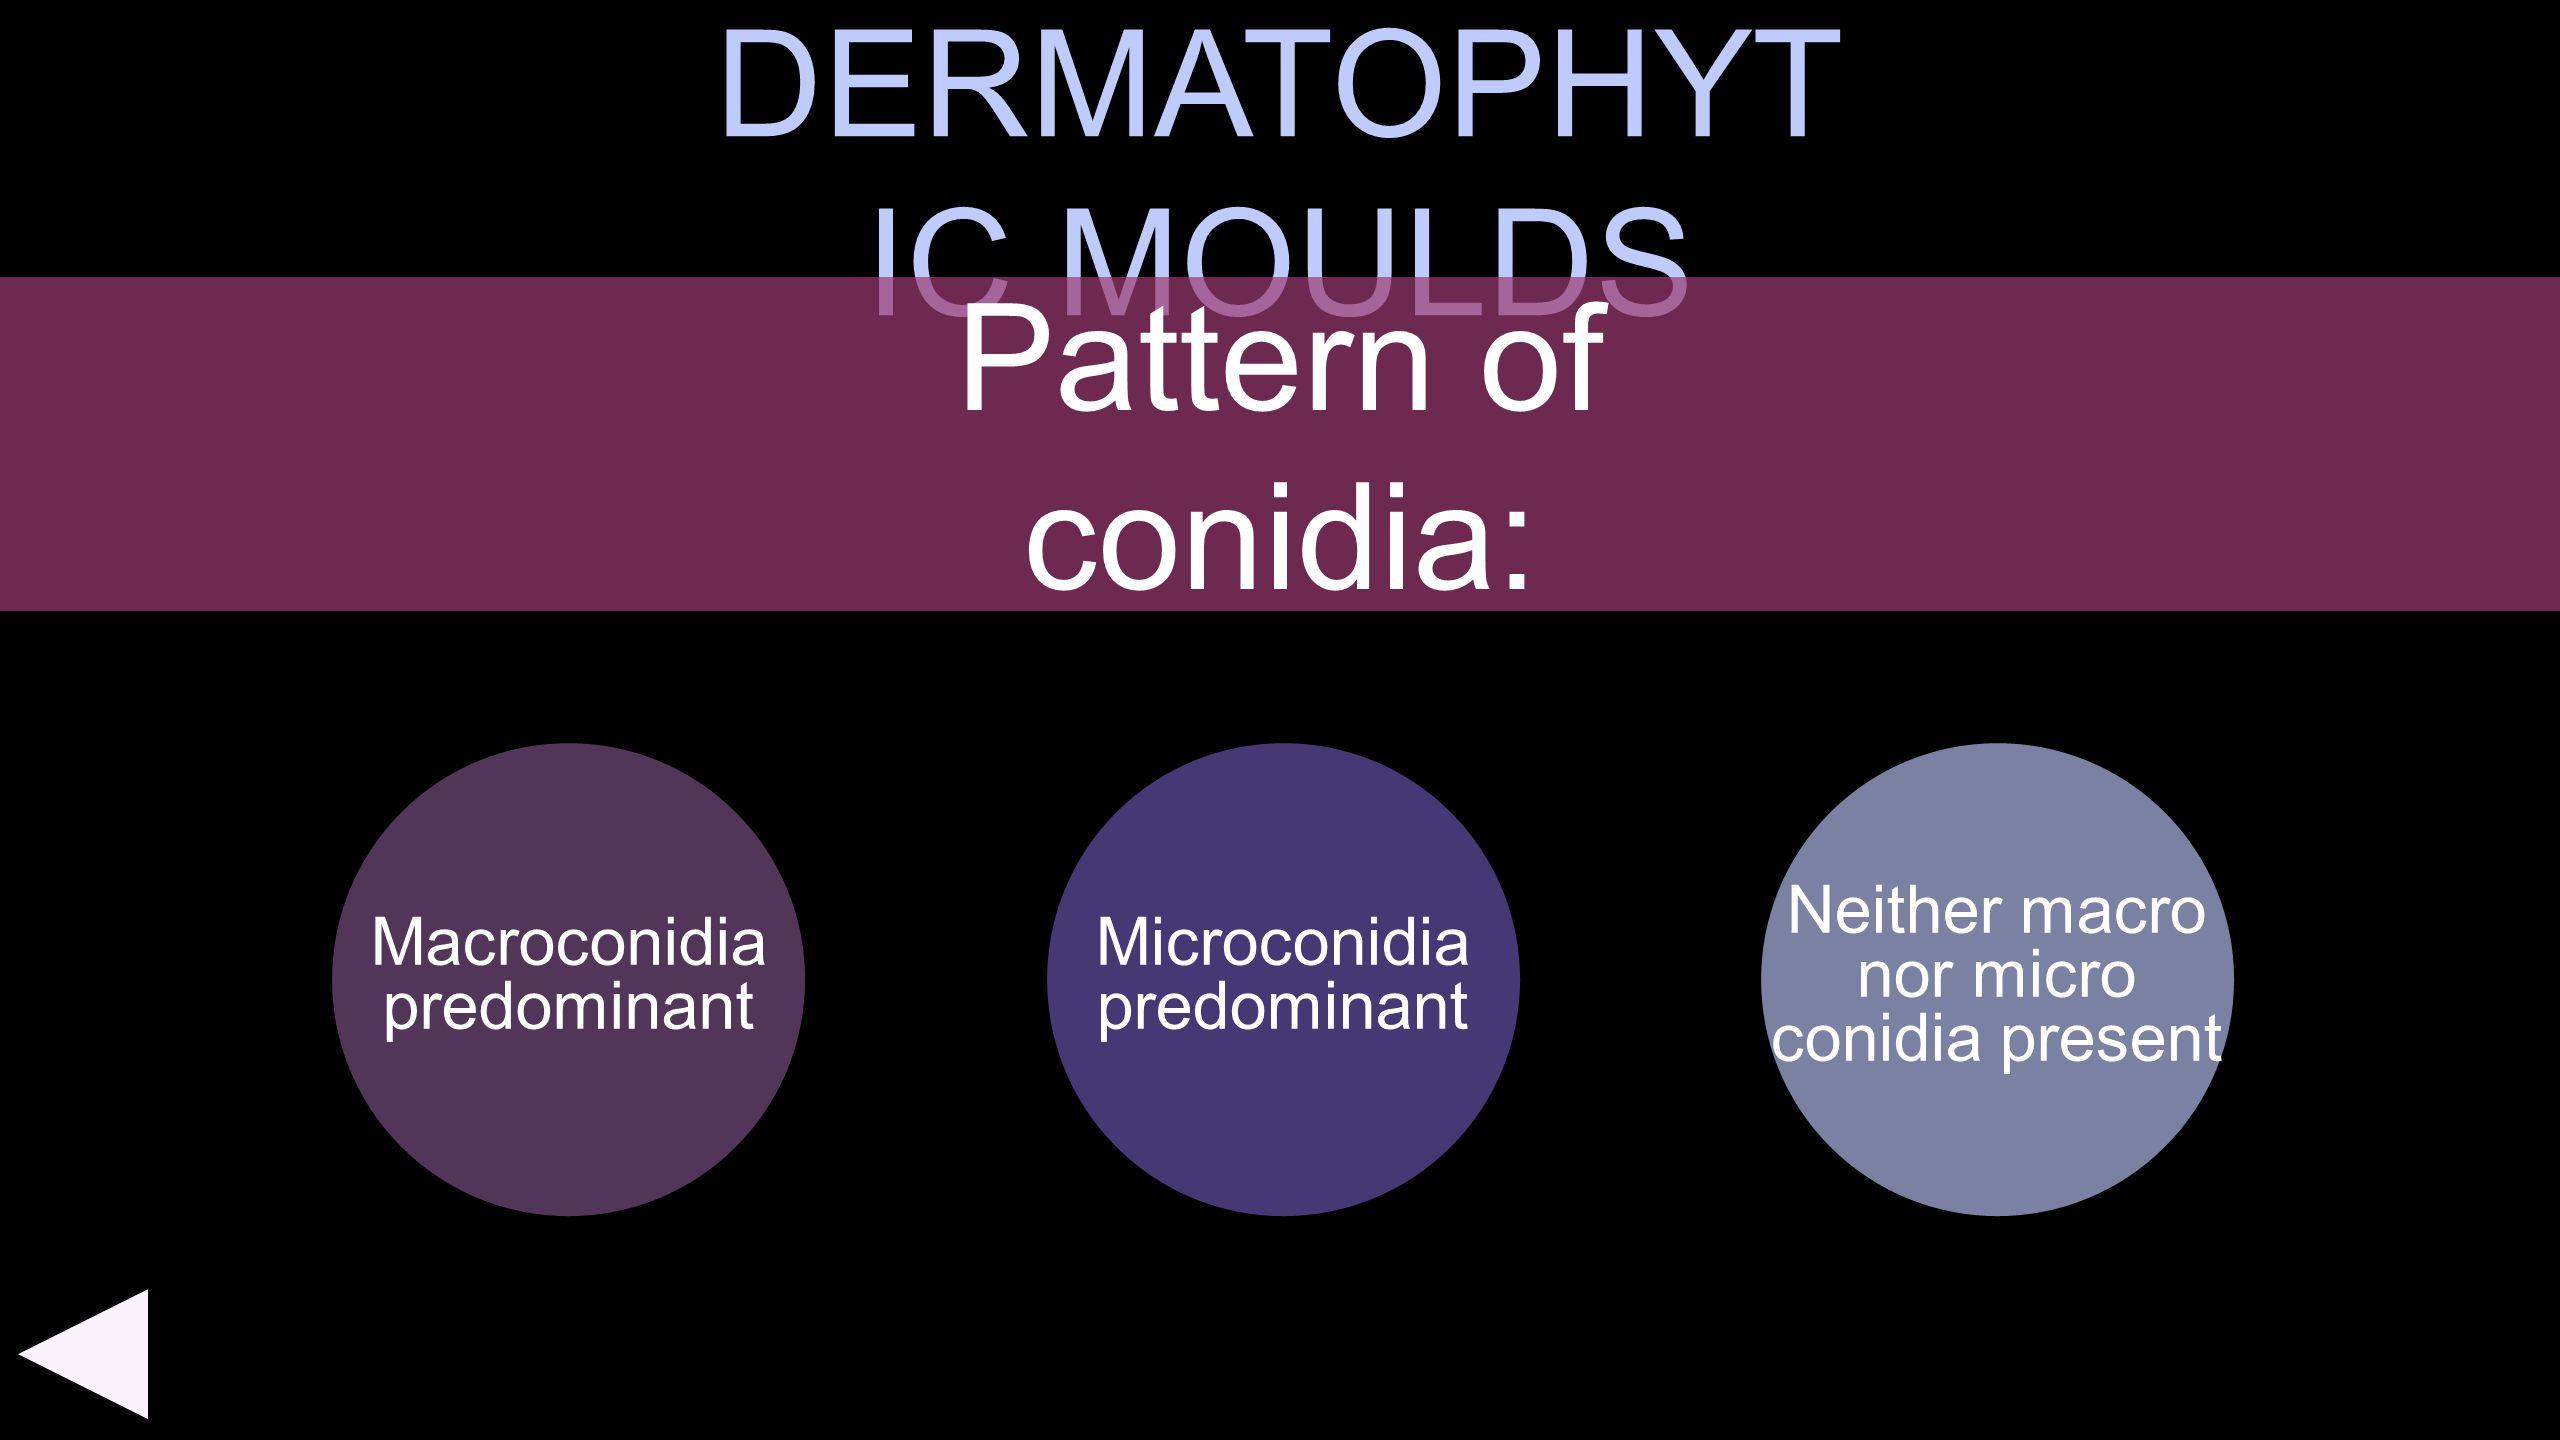 DERMATOPHYT IC MOULDS Macroconidia predominant Neither macro nor micro conidia present Pattern of conidia: Microconidia predominant